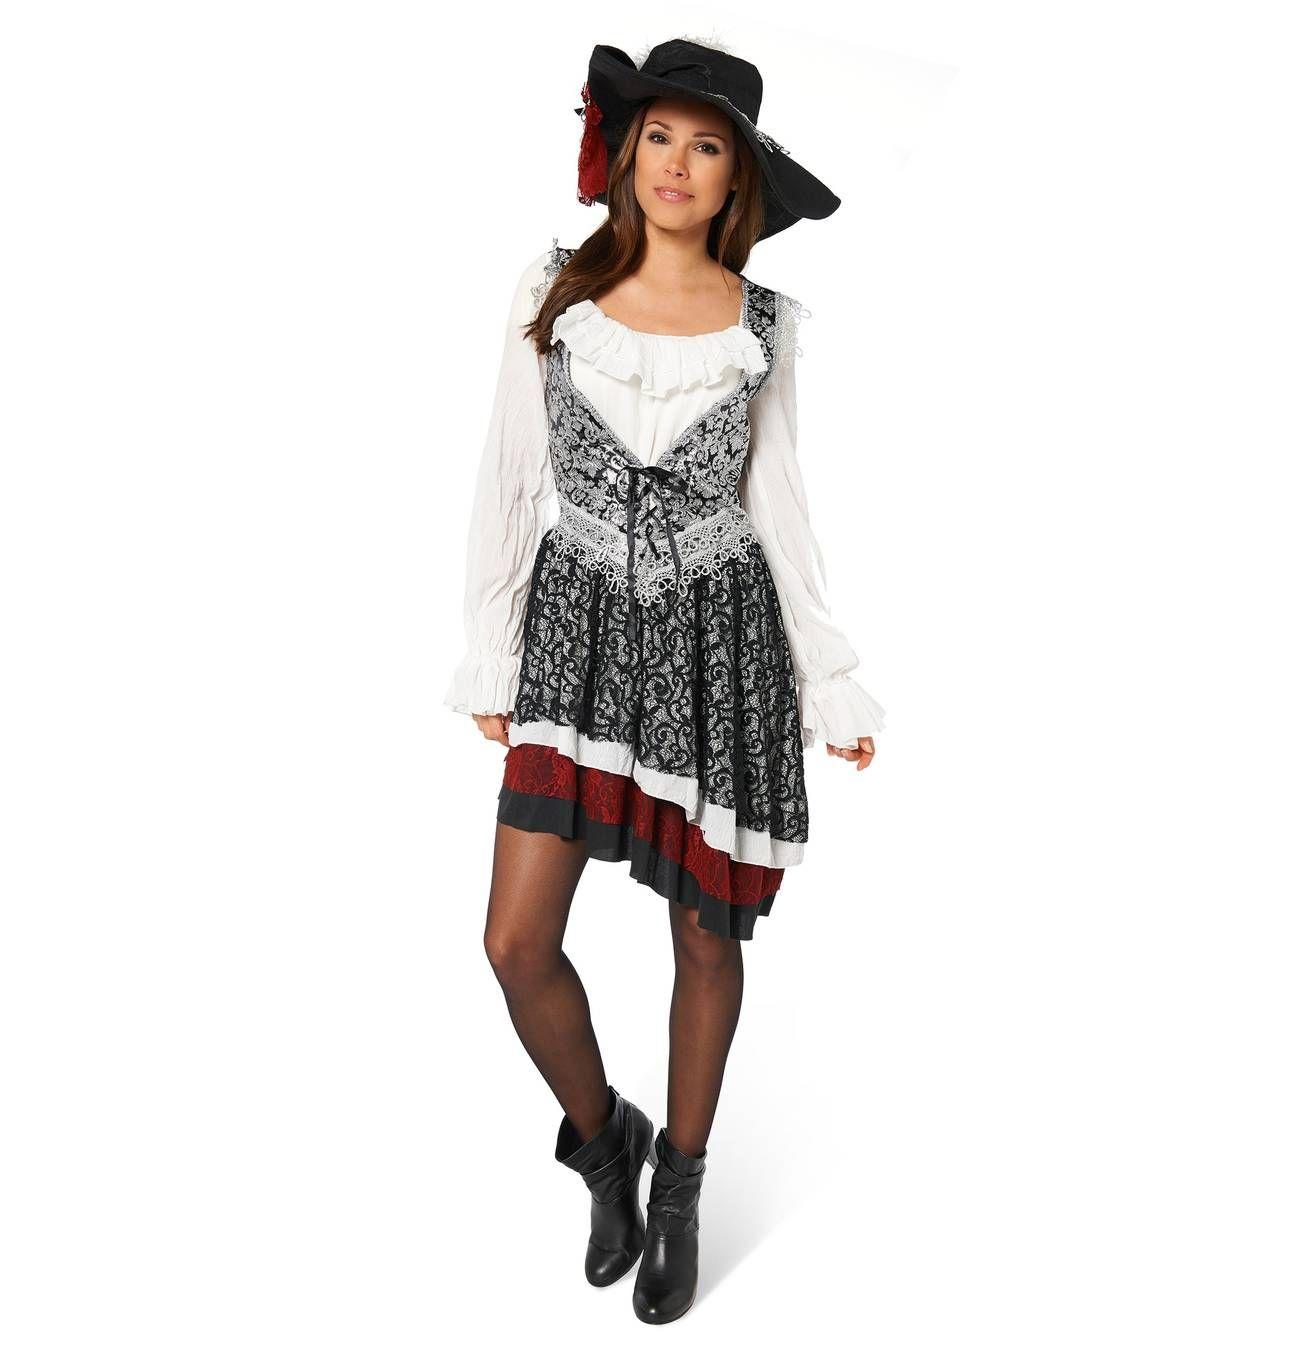 fasching kostüme damen galeria kaufhof